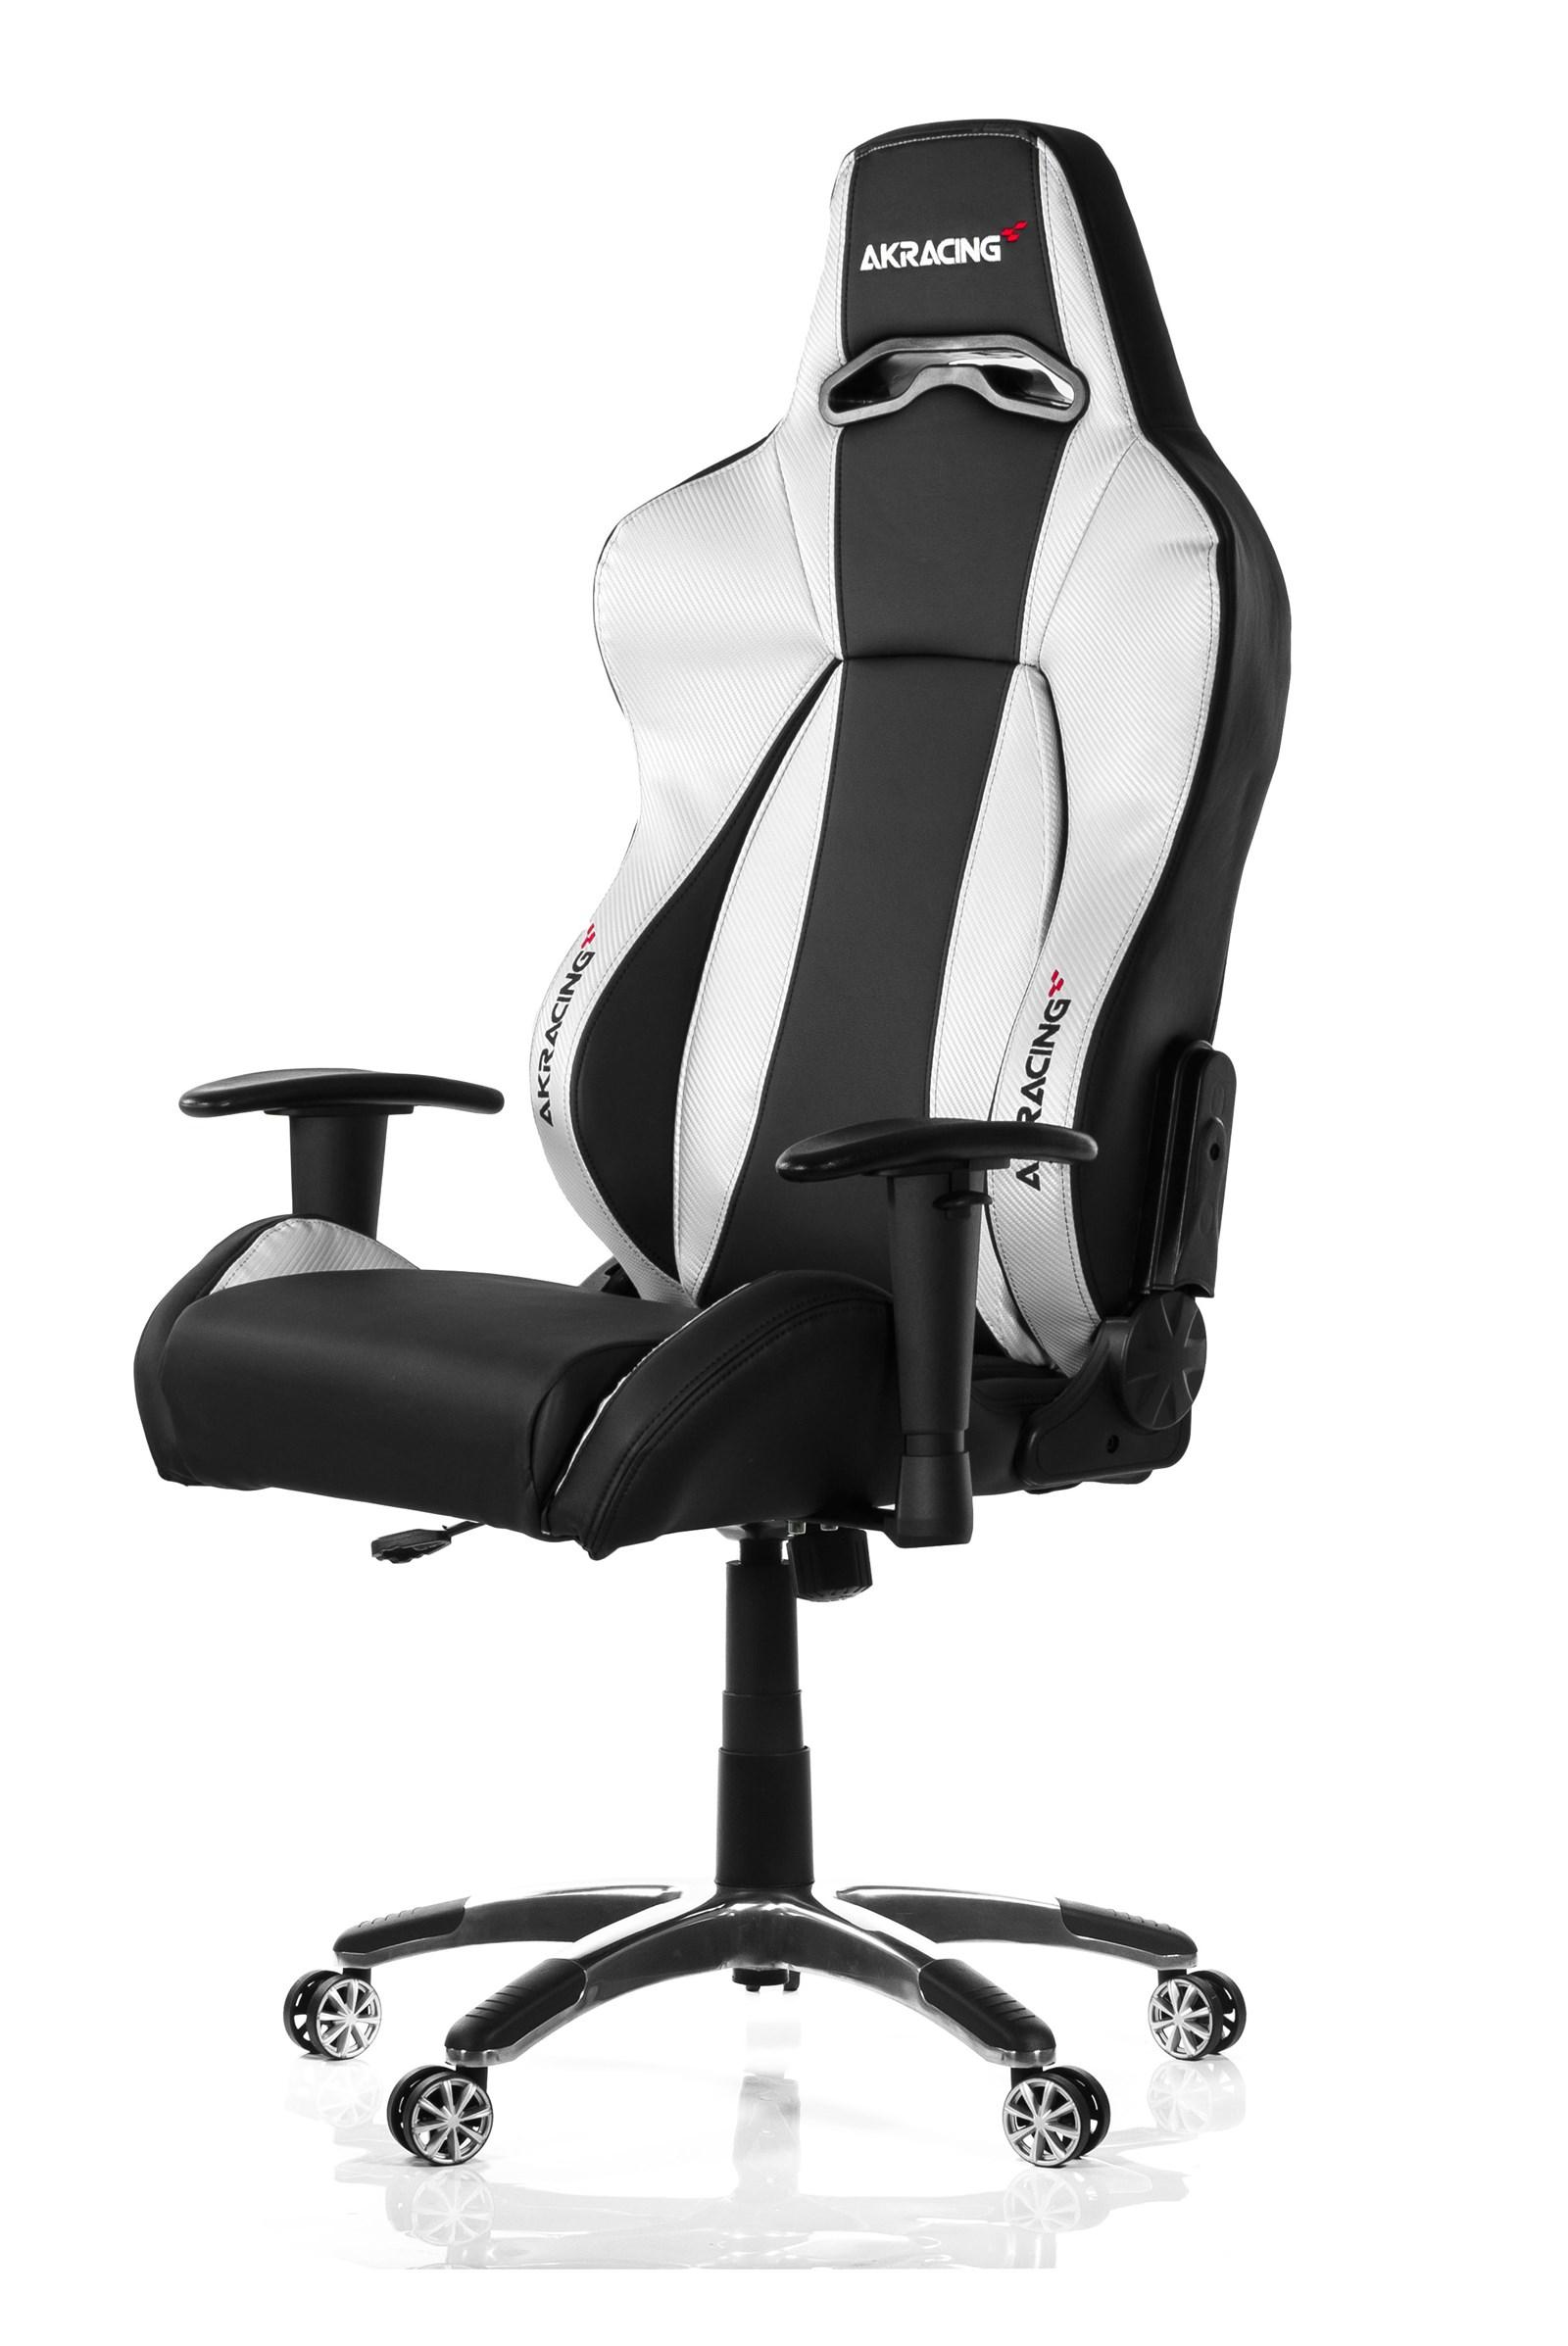 AK Racing Premium V2 Gaming Chair Black & Silver AK 7002 BS